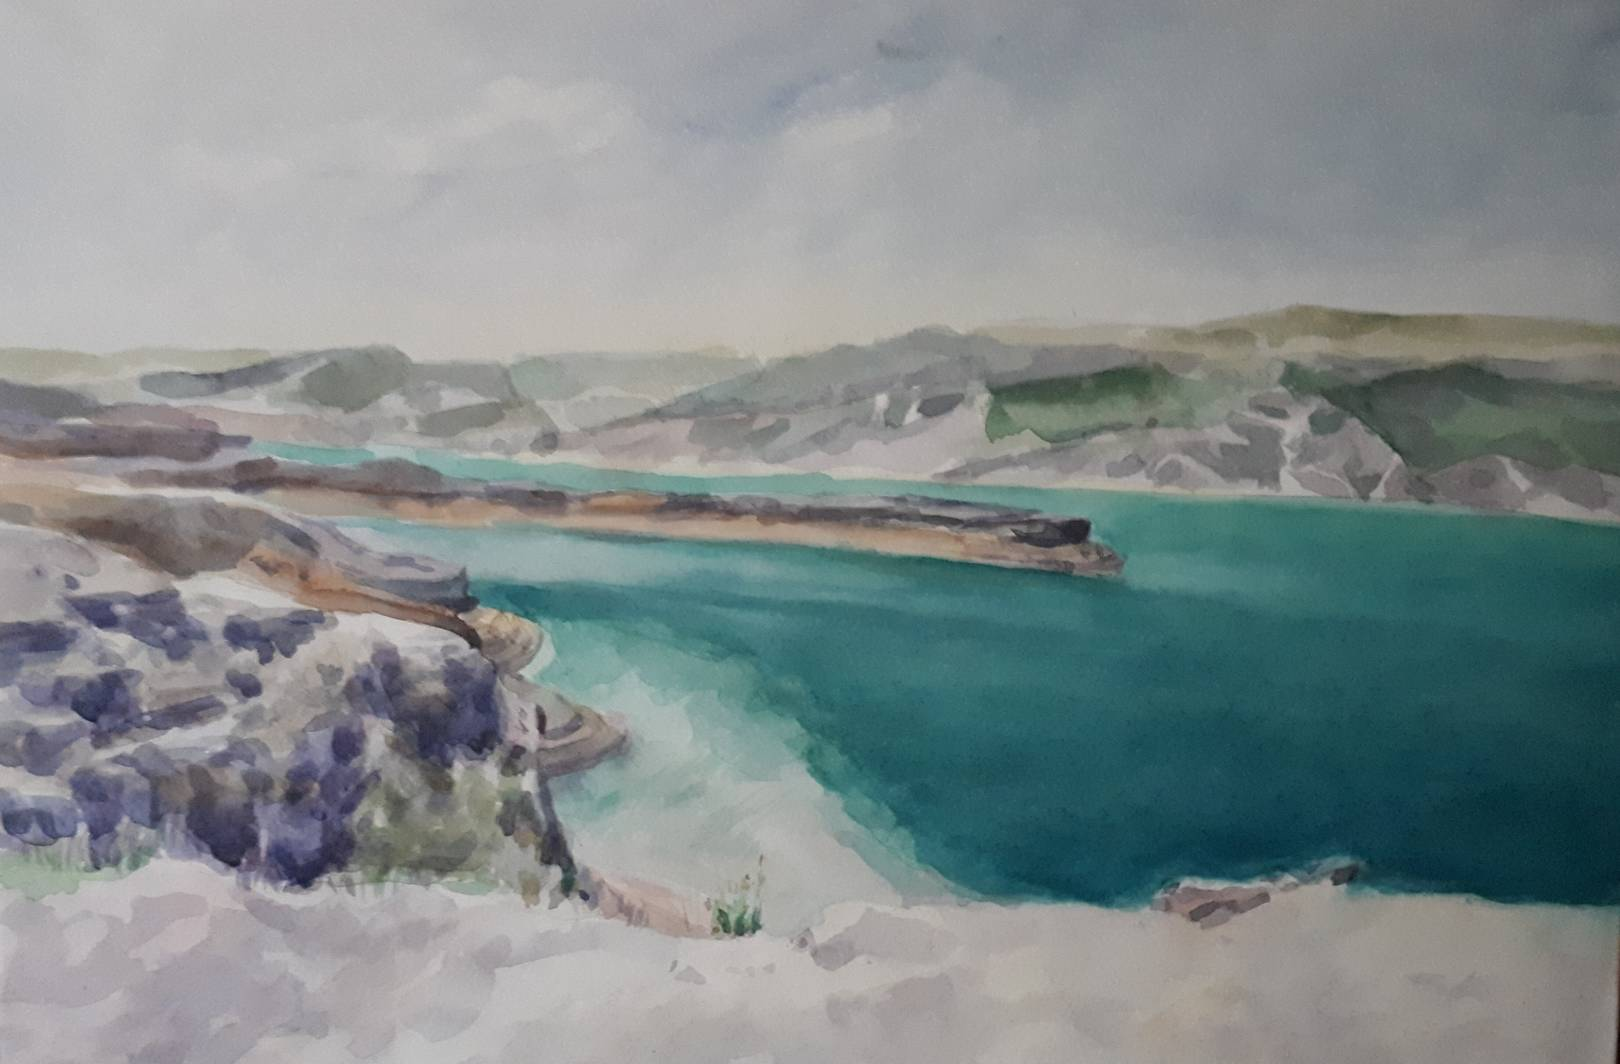 """Каньон реки Сулак, Дагестан"", бумага, акварель, 27х42, 2019"